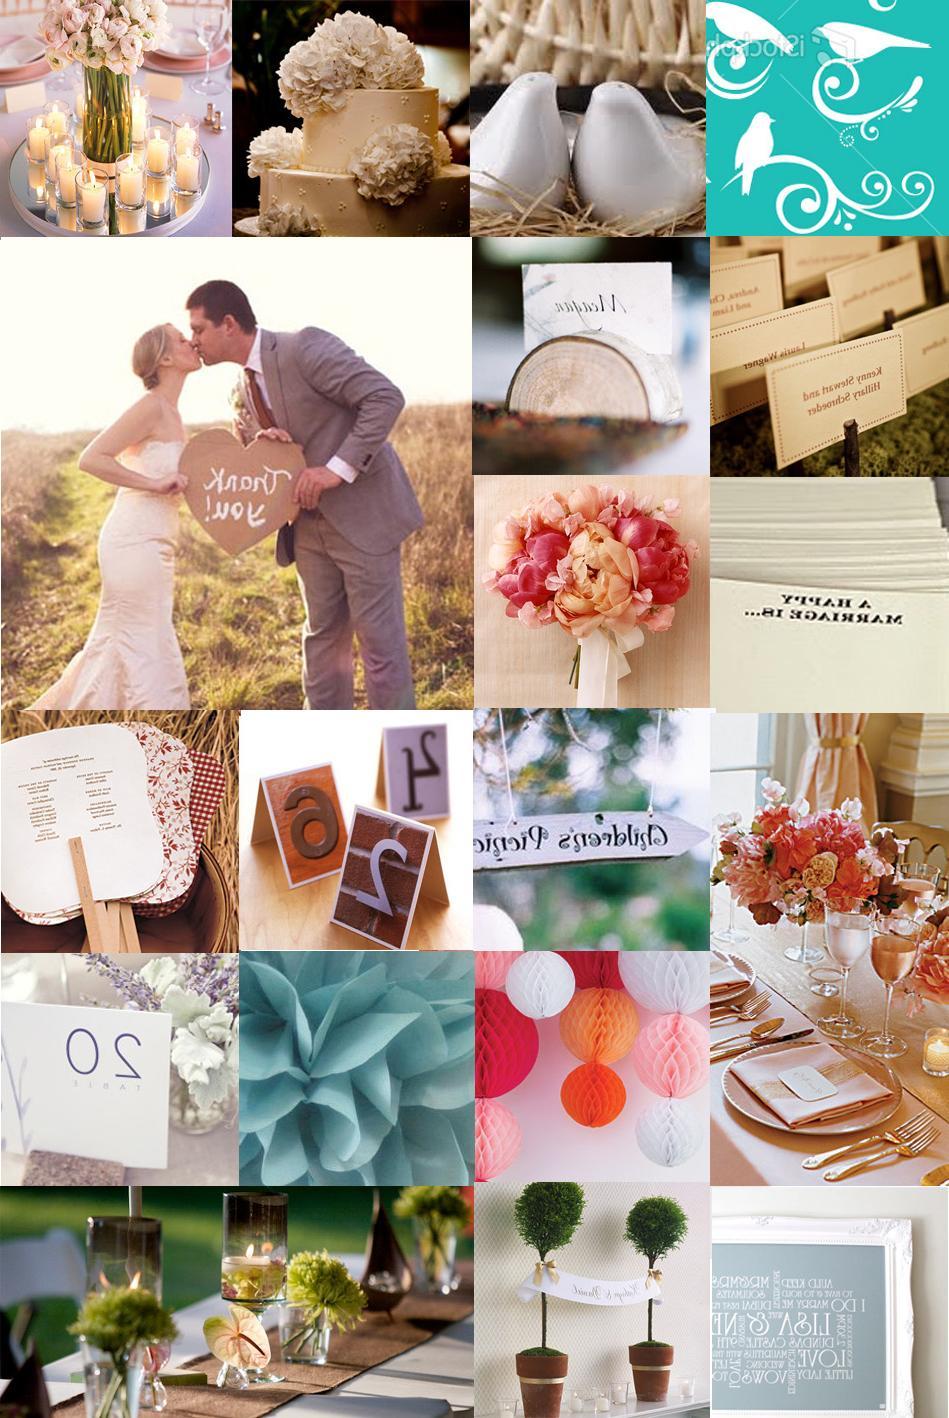 garden-themed wedding. 2.